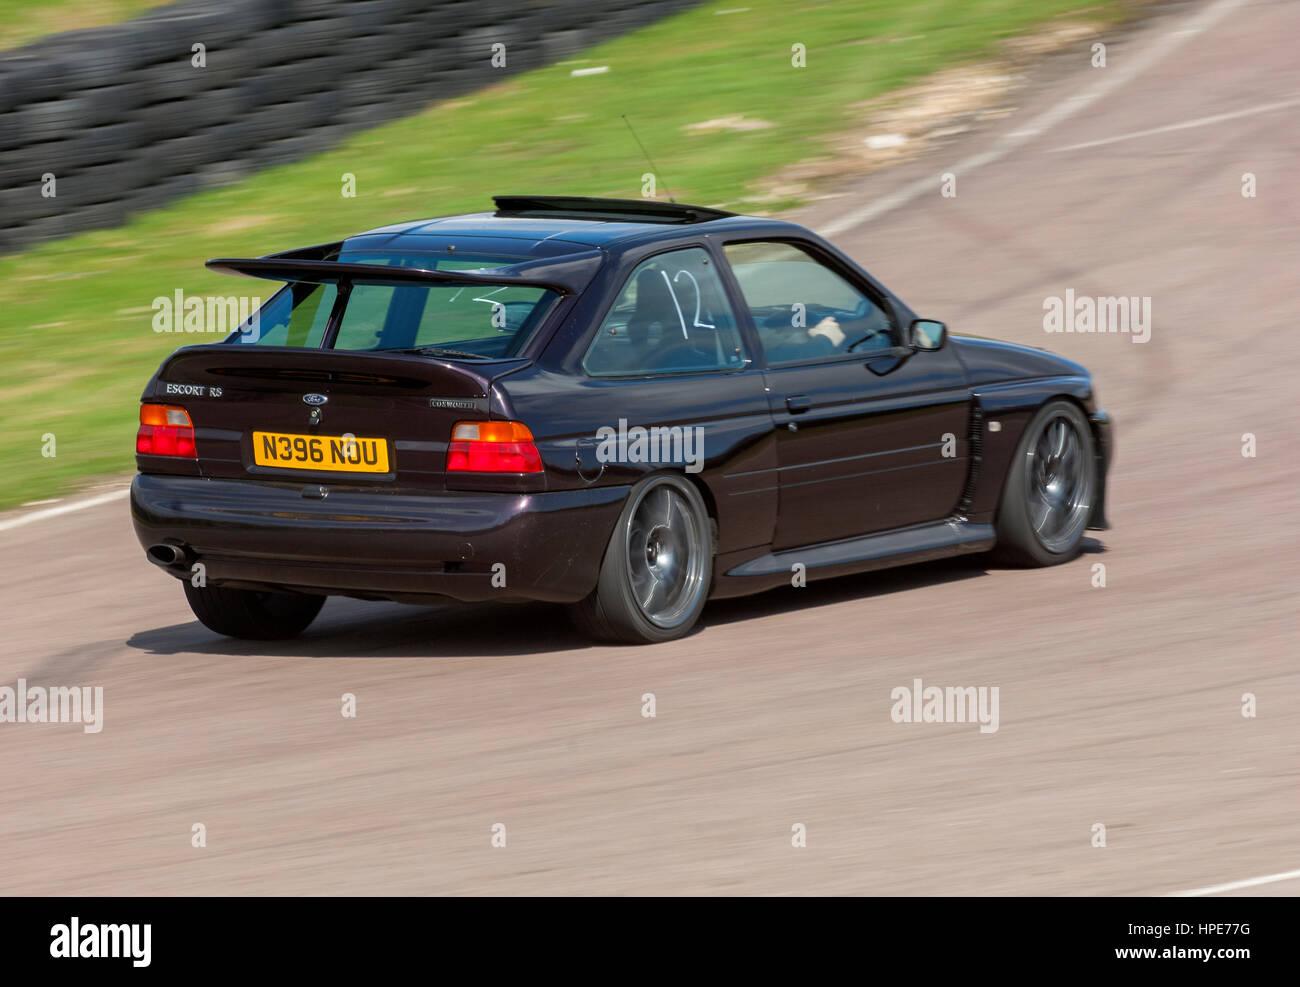 1995 mk5 ford escort cosworth stock image